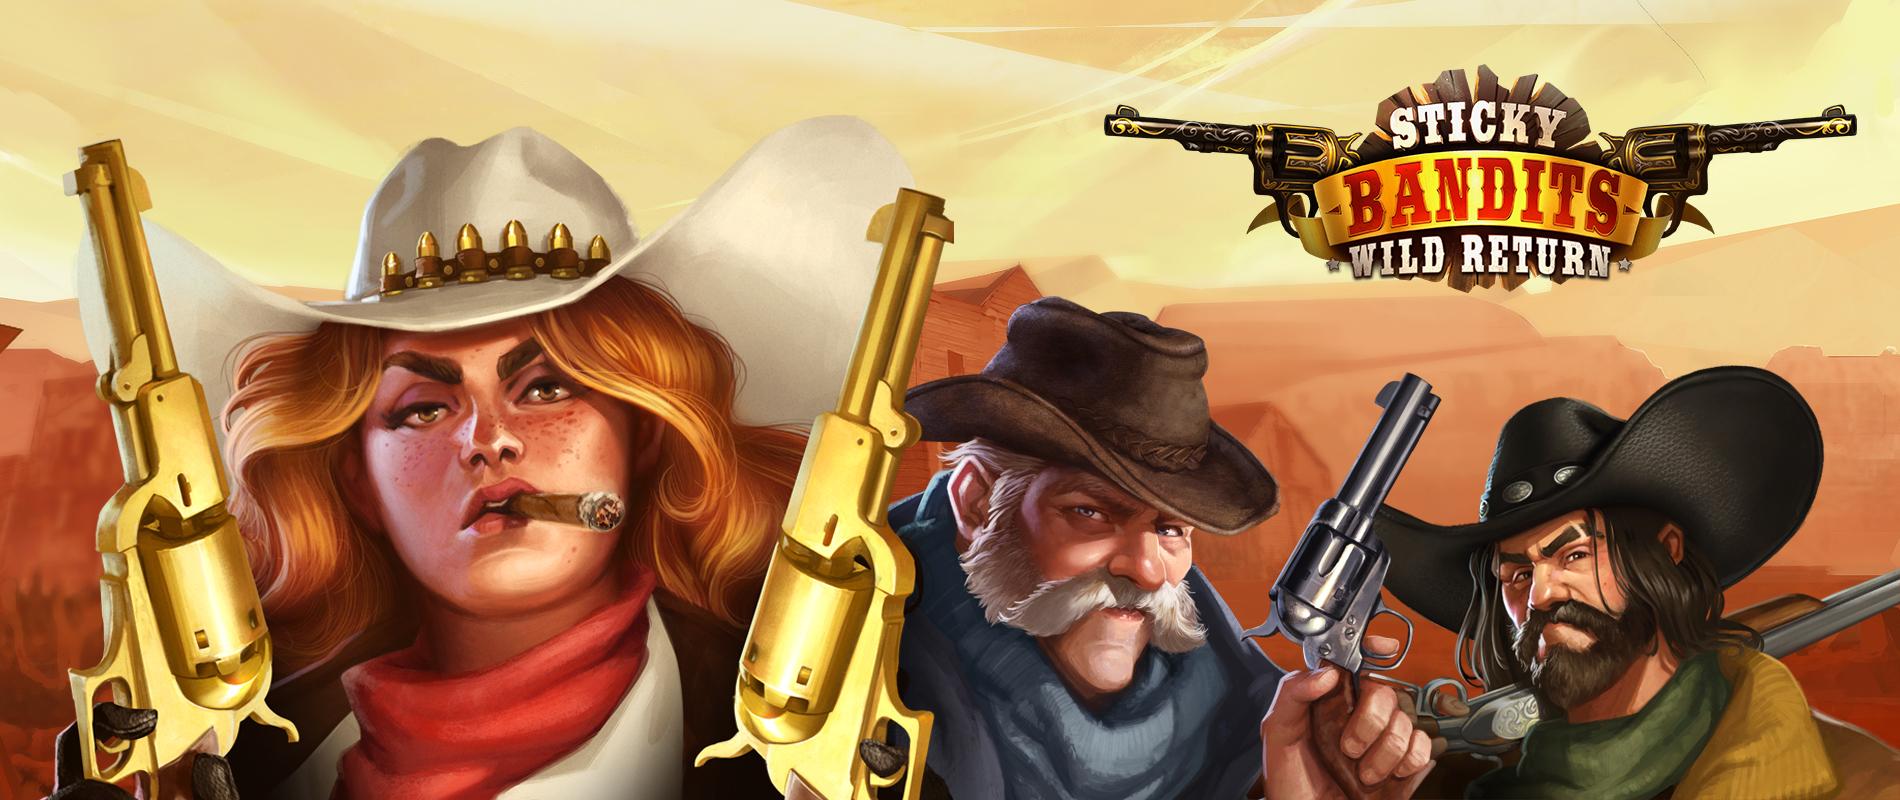 Total-Casino-Sticky-Bandits